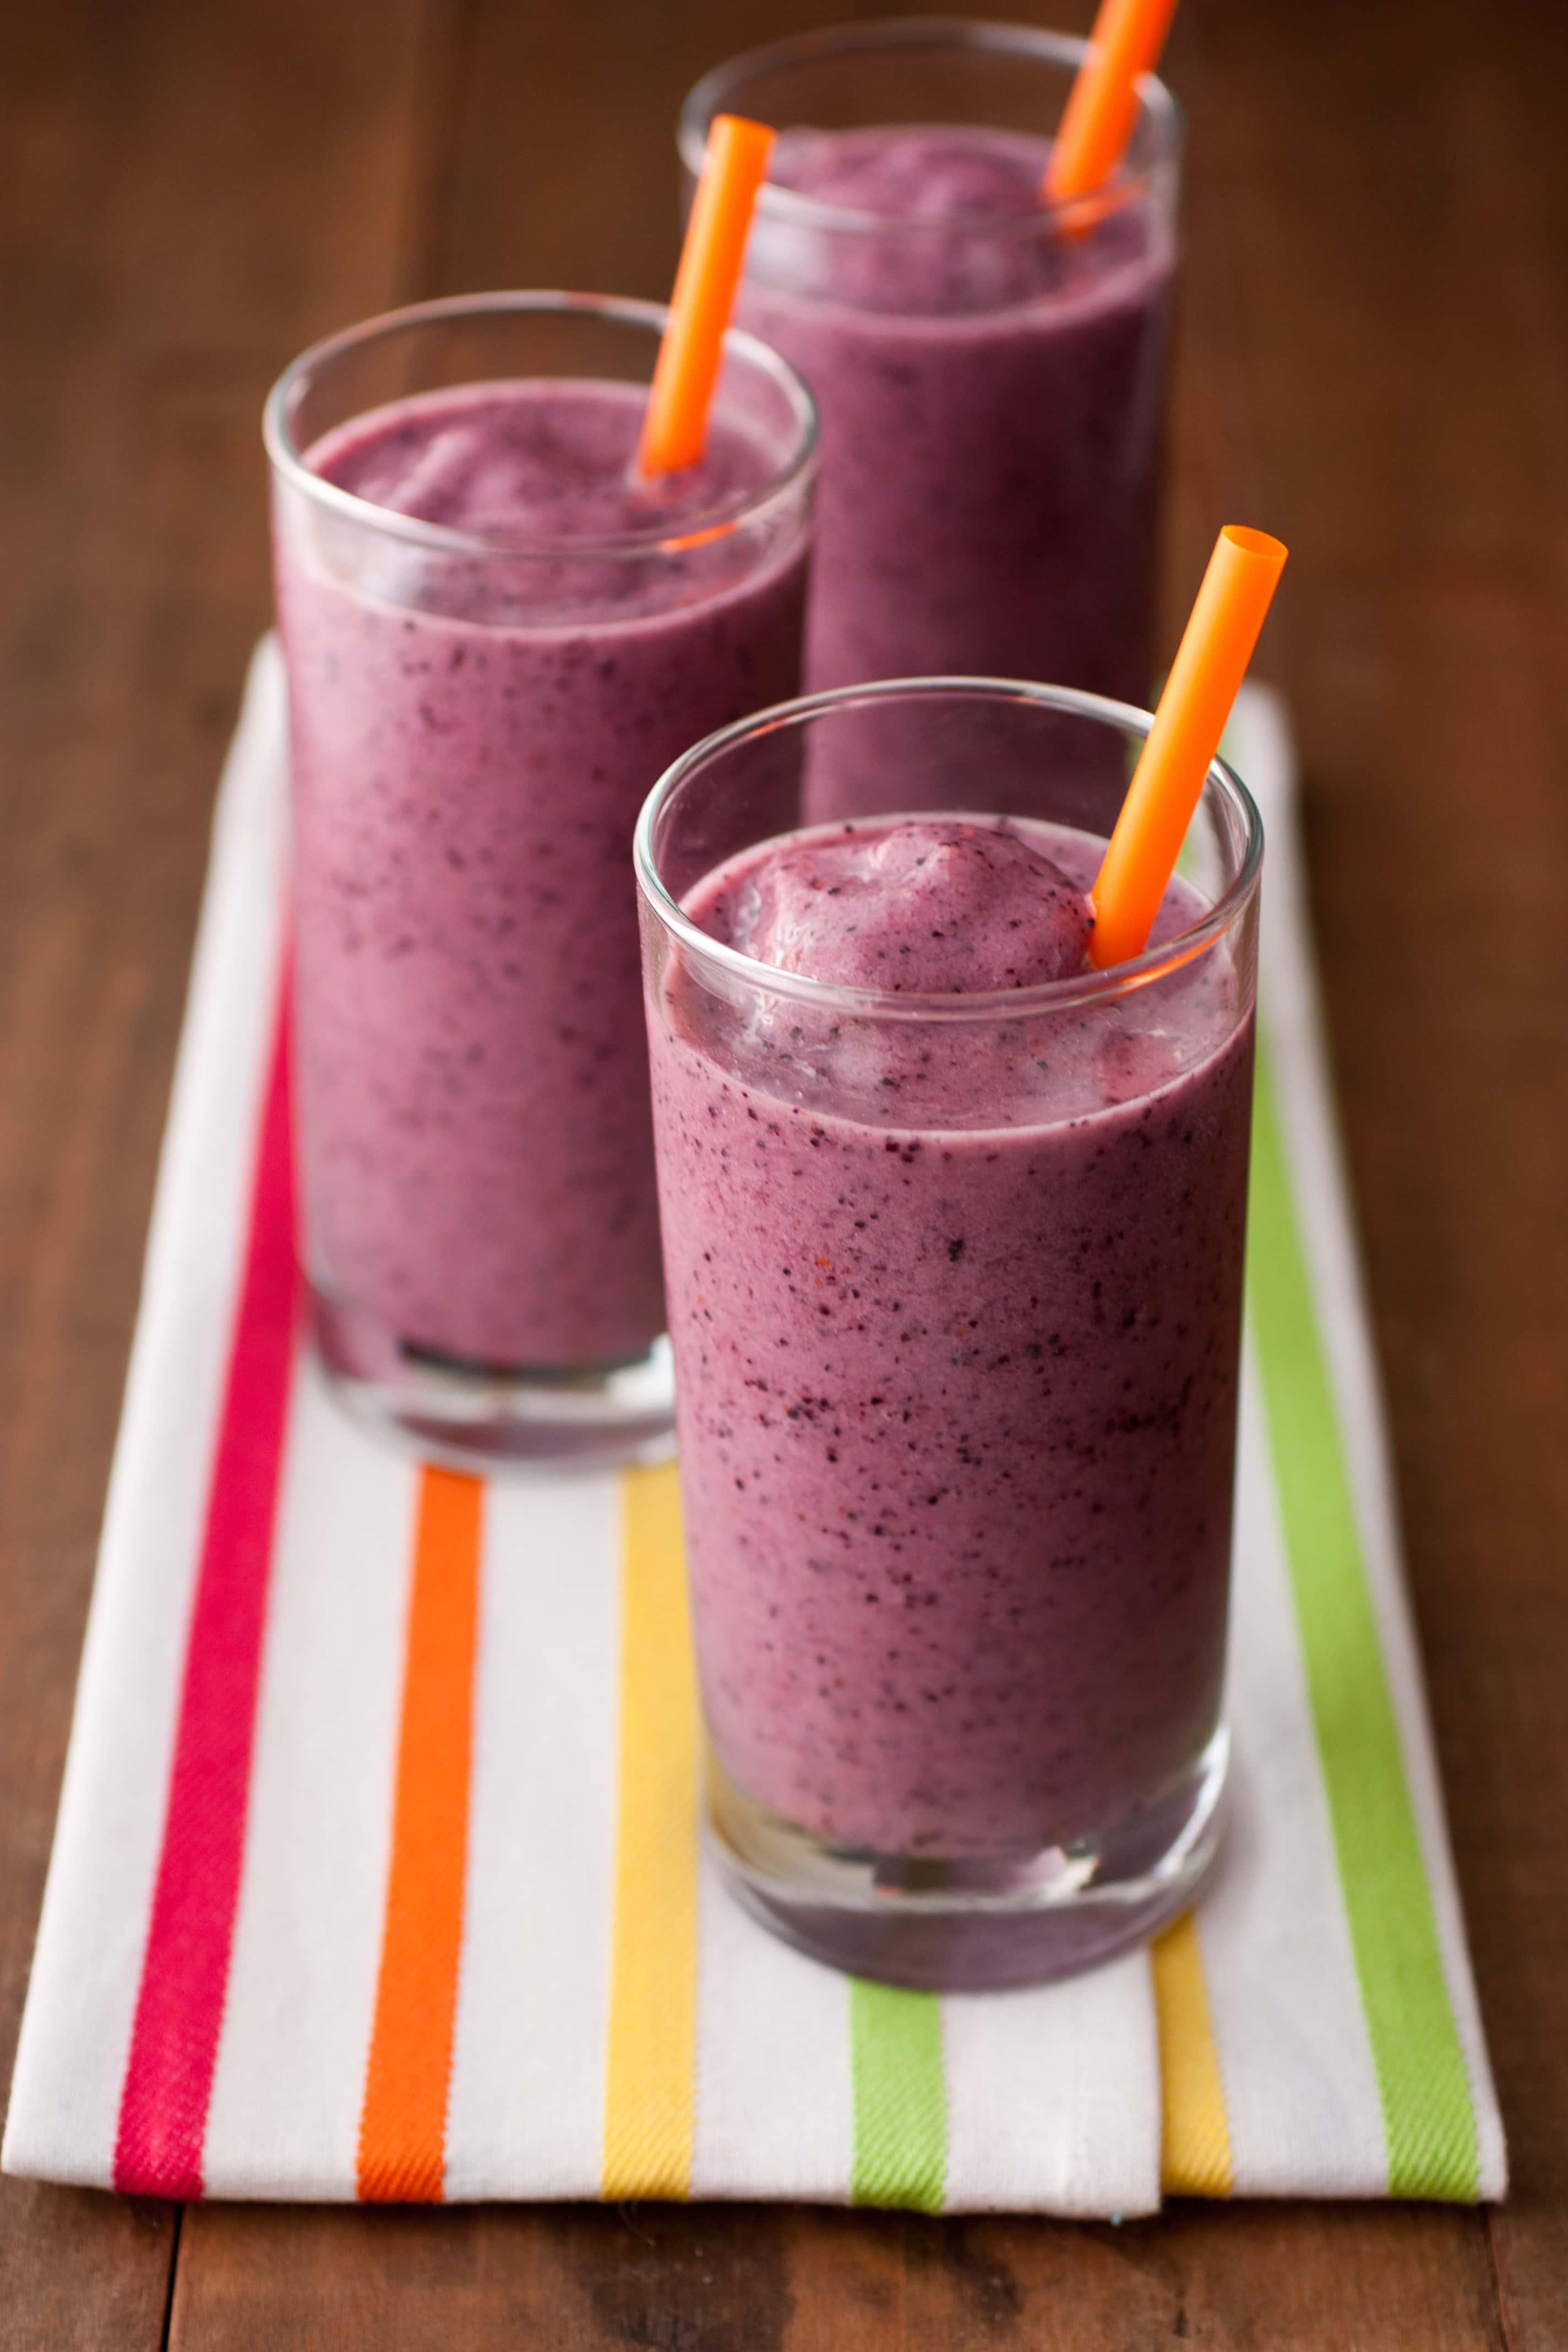 Copycat Jamba Juice Banana Berry Smoothies Recipe